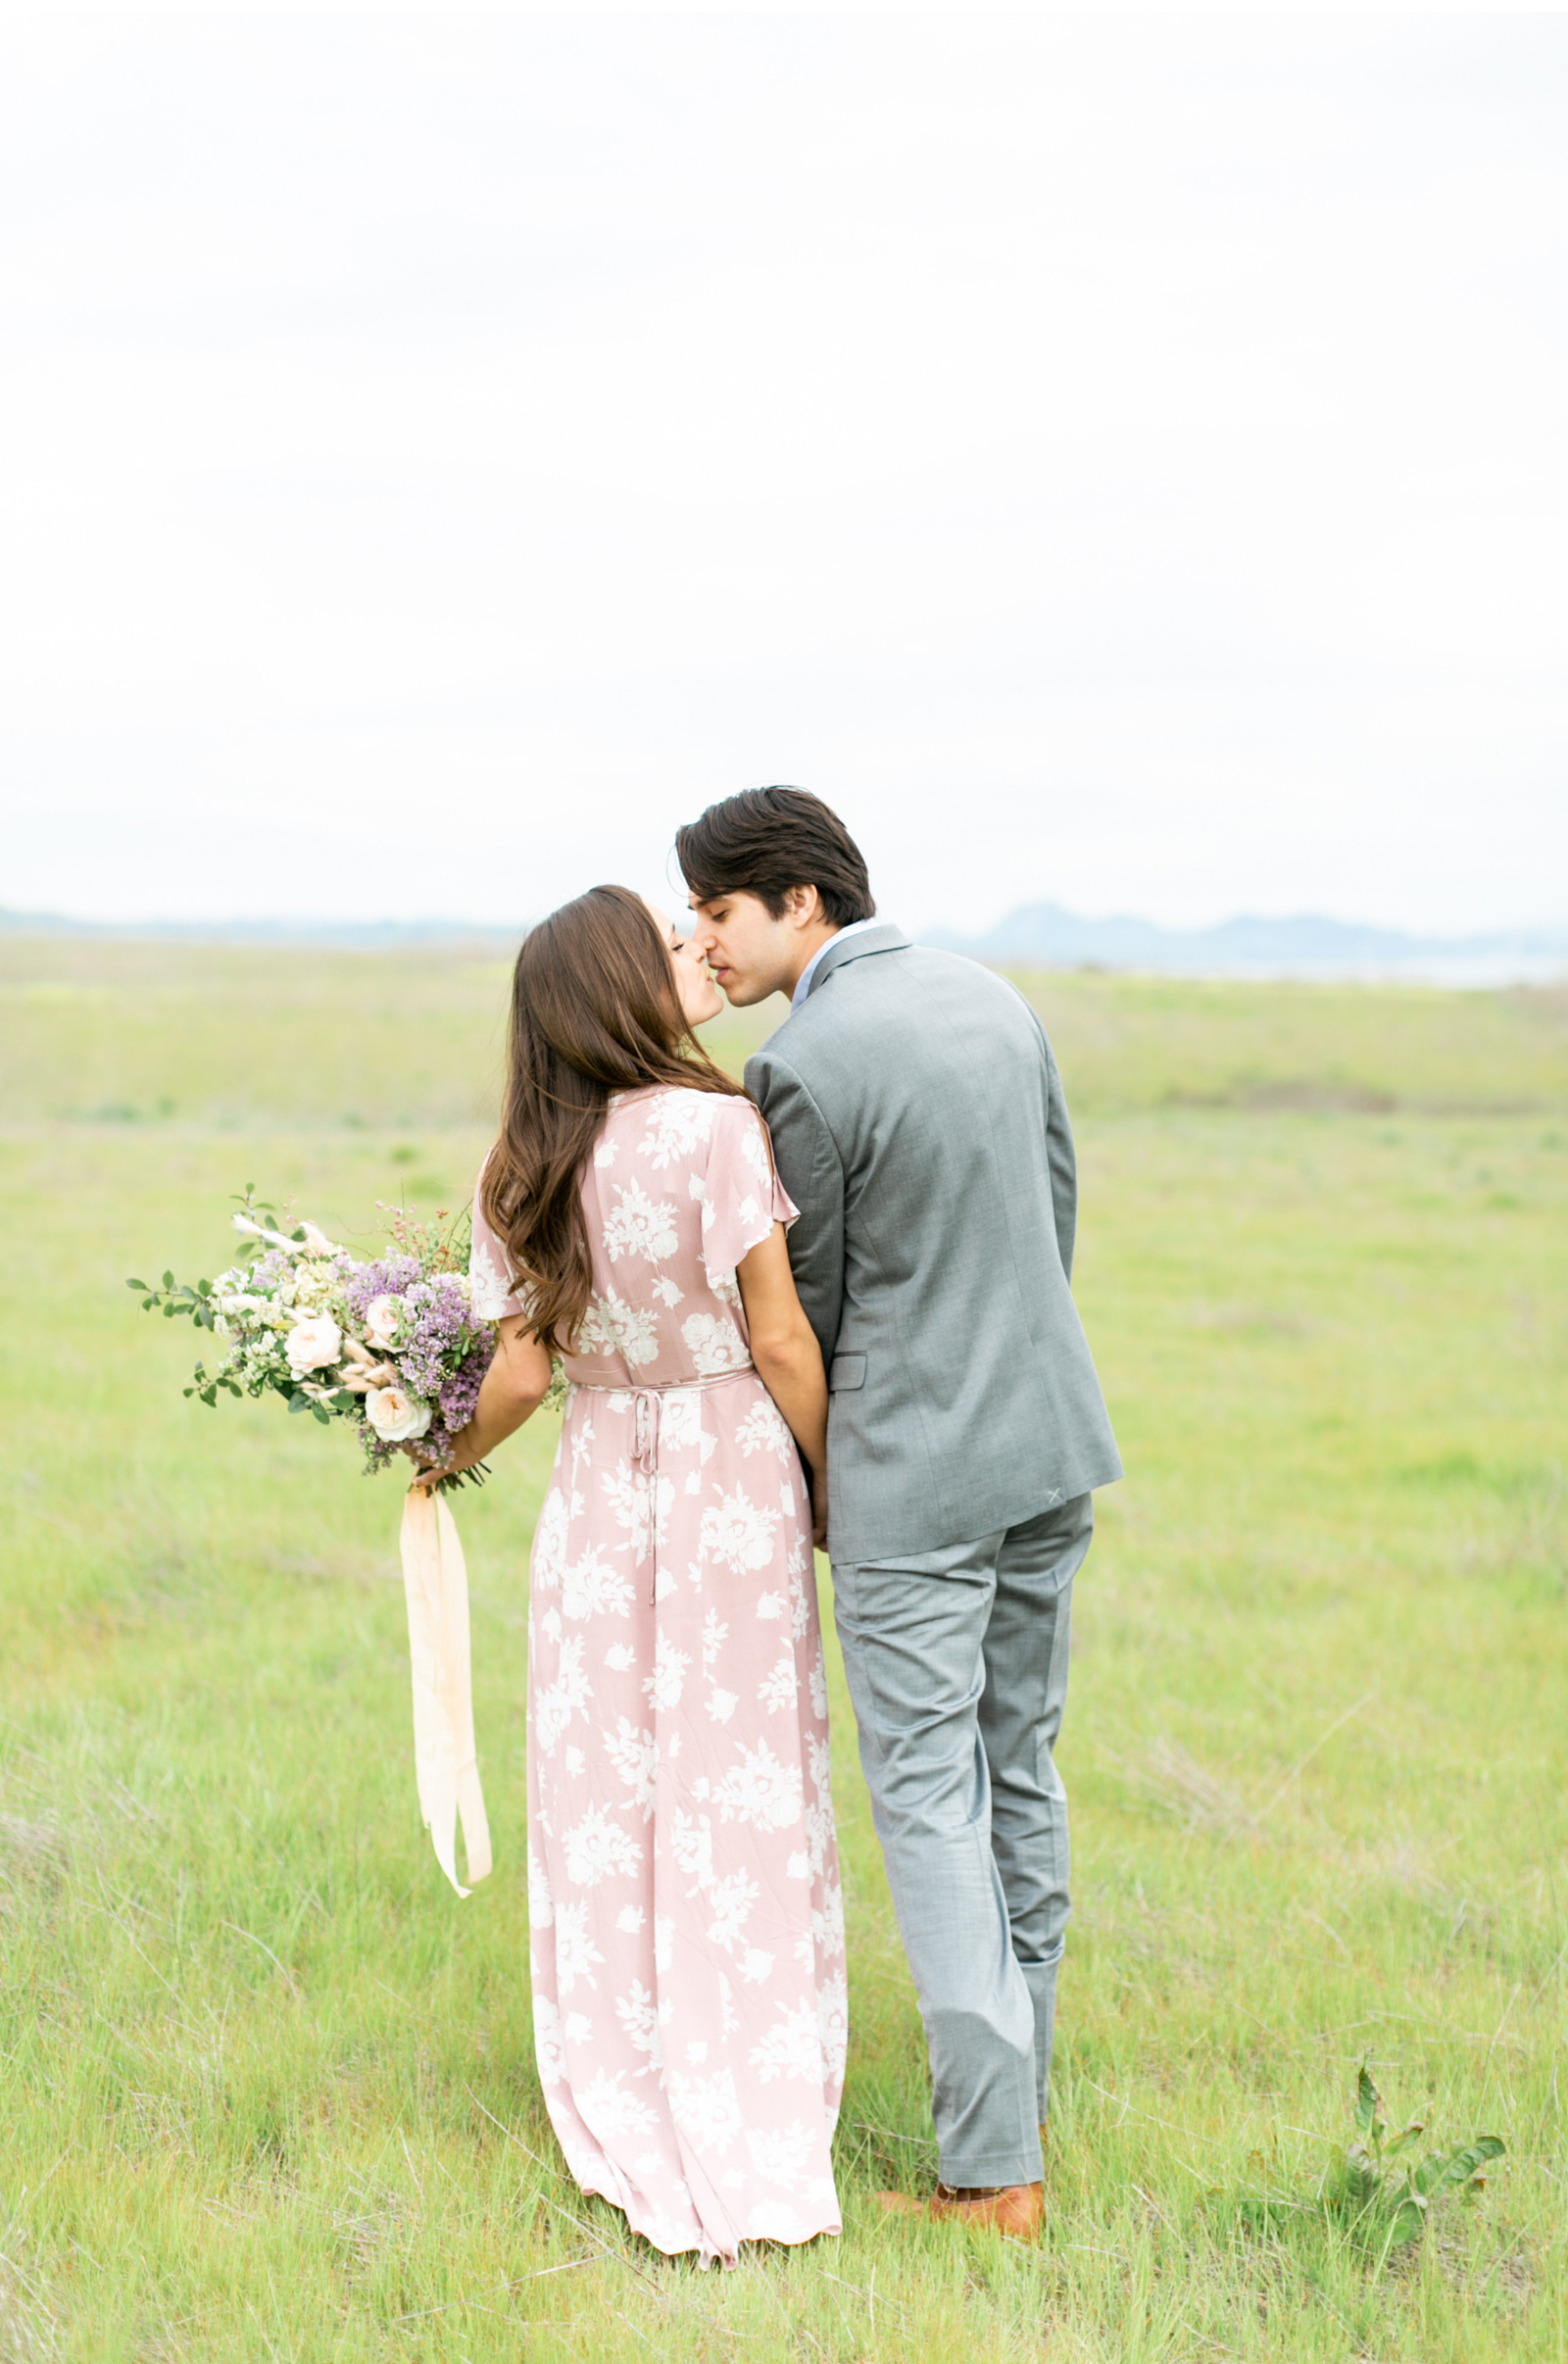 Malibu-Wedding-Photographer-Natalie-Schutt-Photography_01.jpg